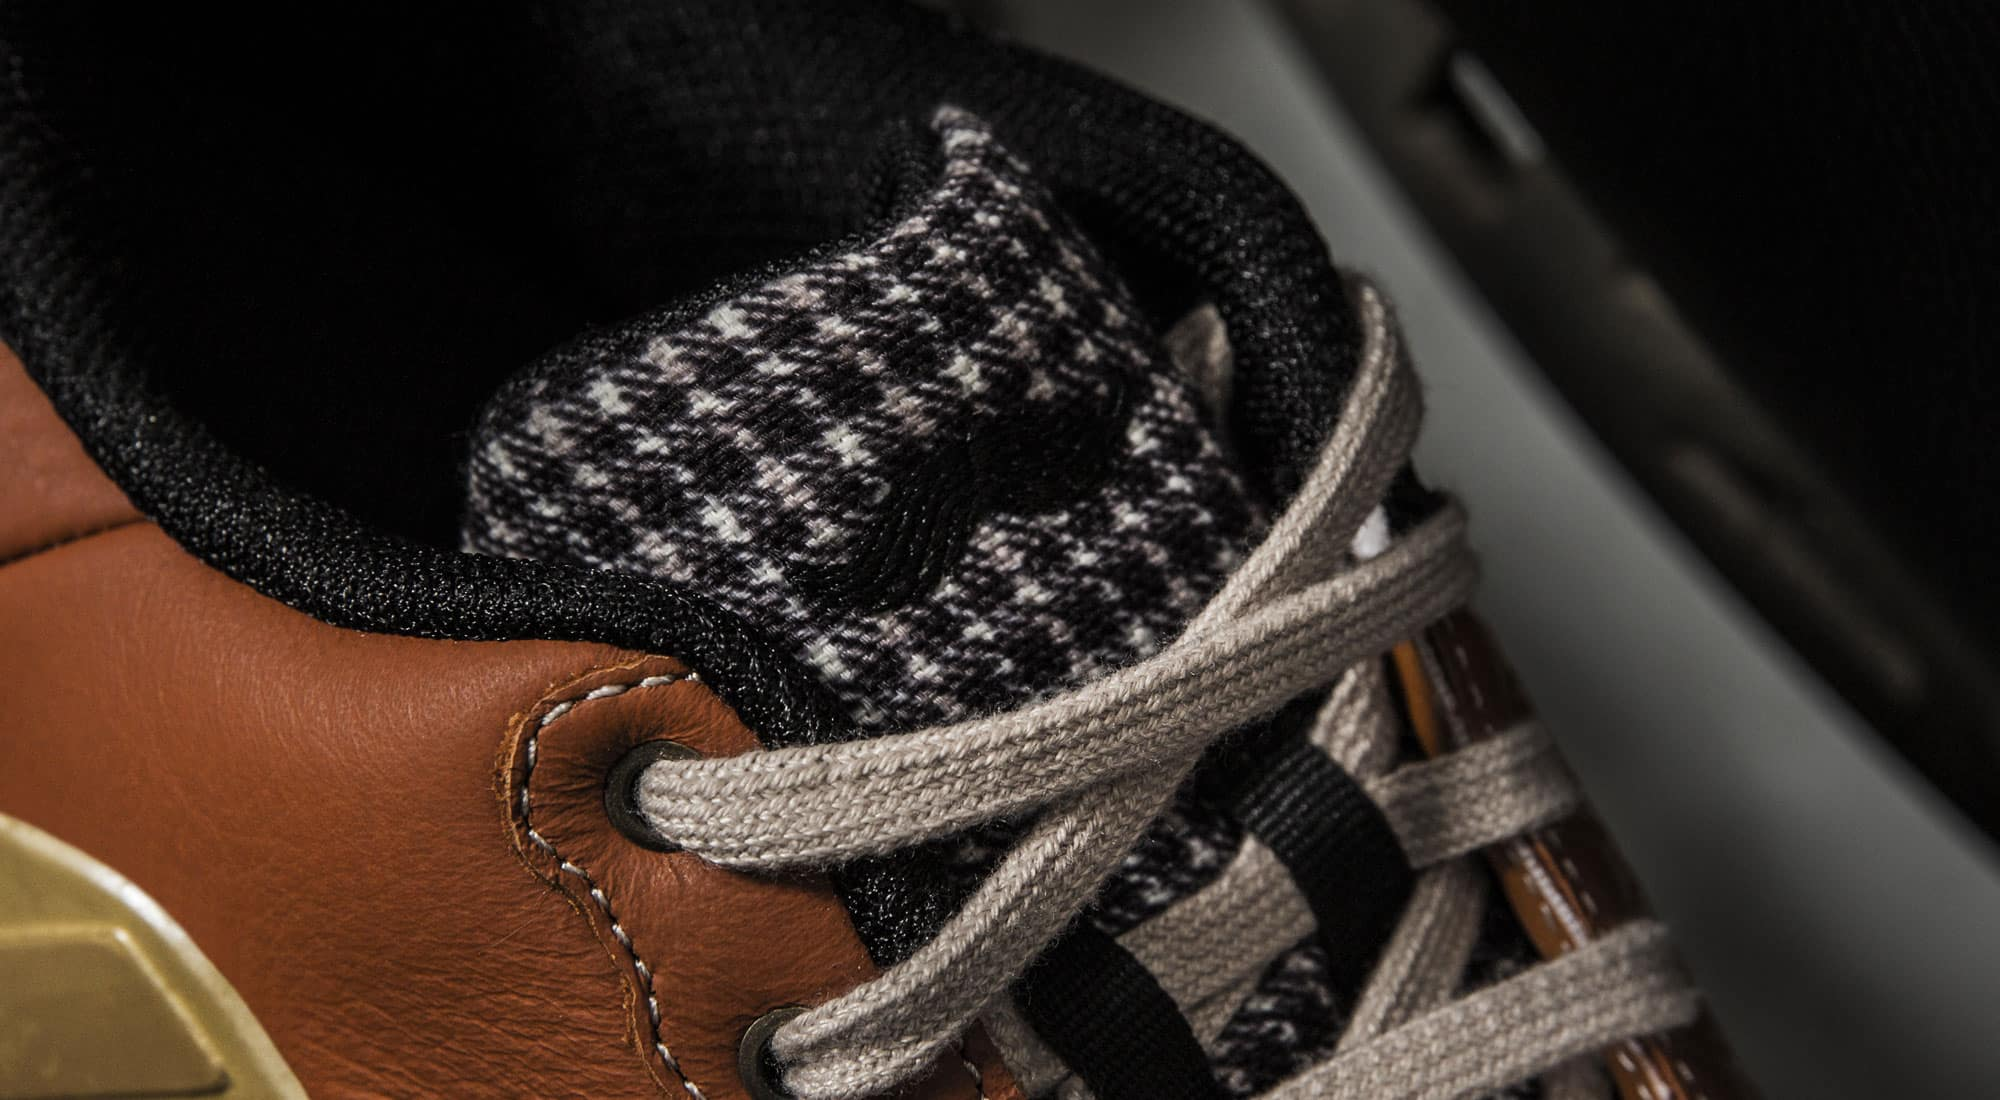 new products f5b72 6bfb3 Une Limitée Mustachio Barricade Adidas thm Magazine Édition